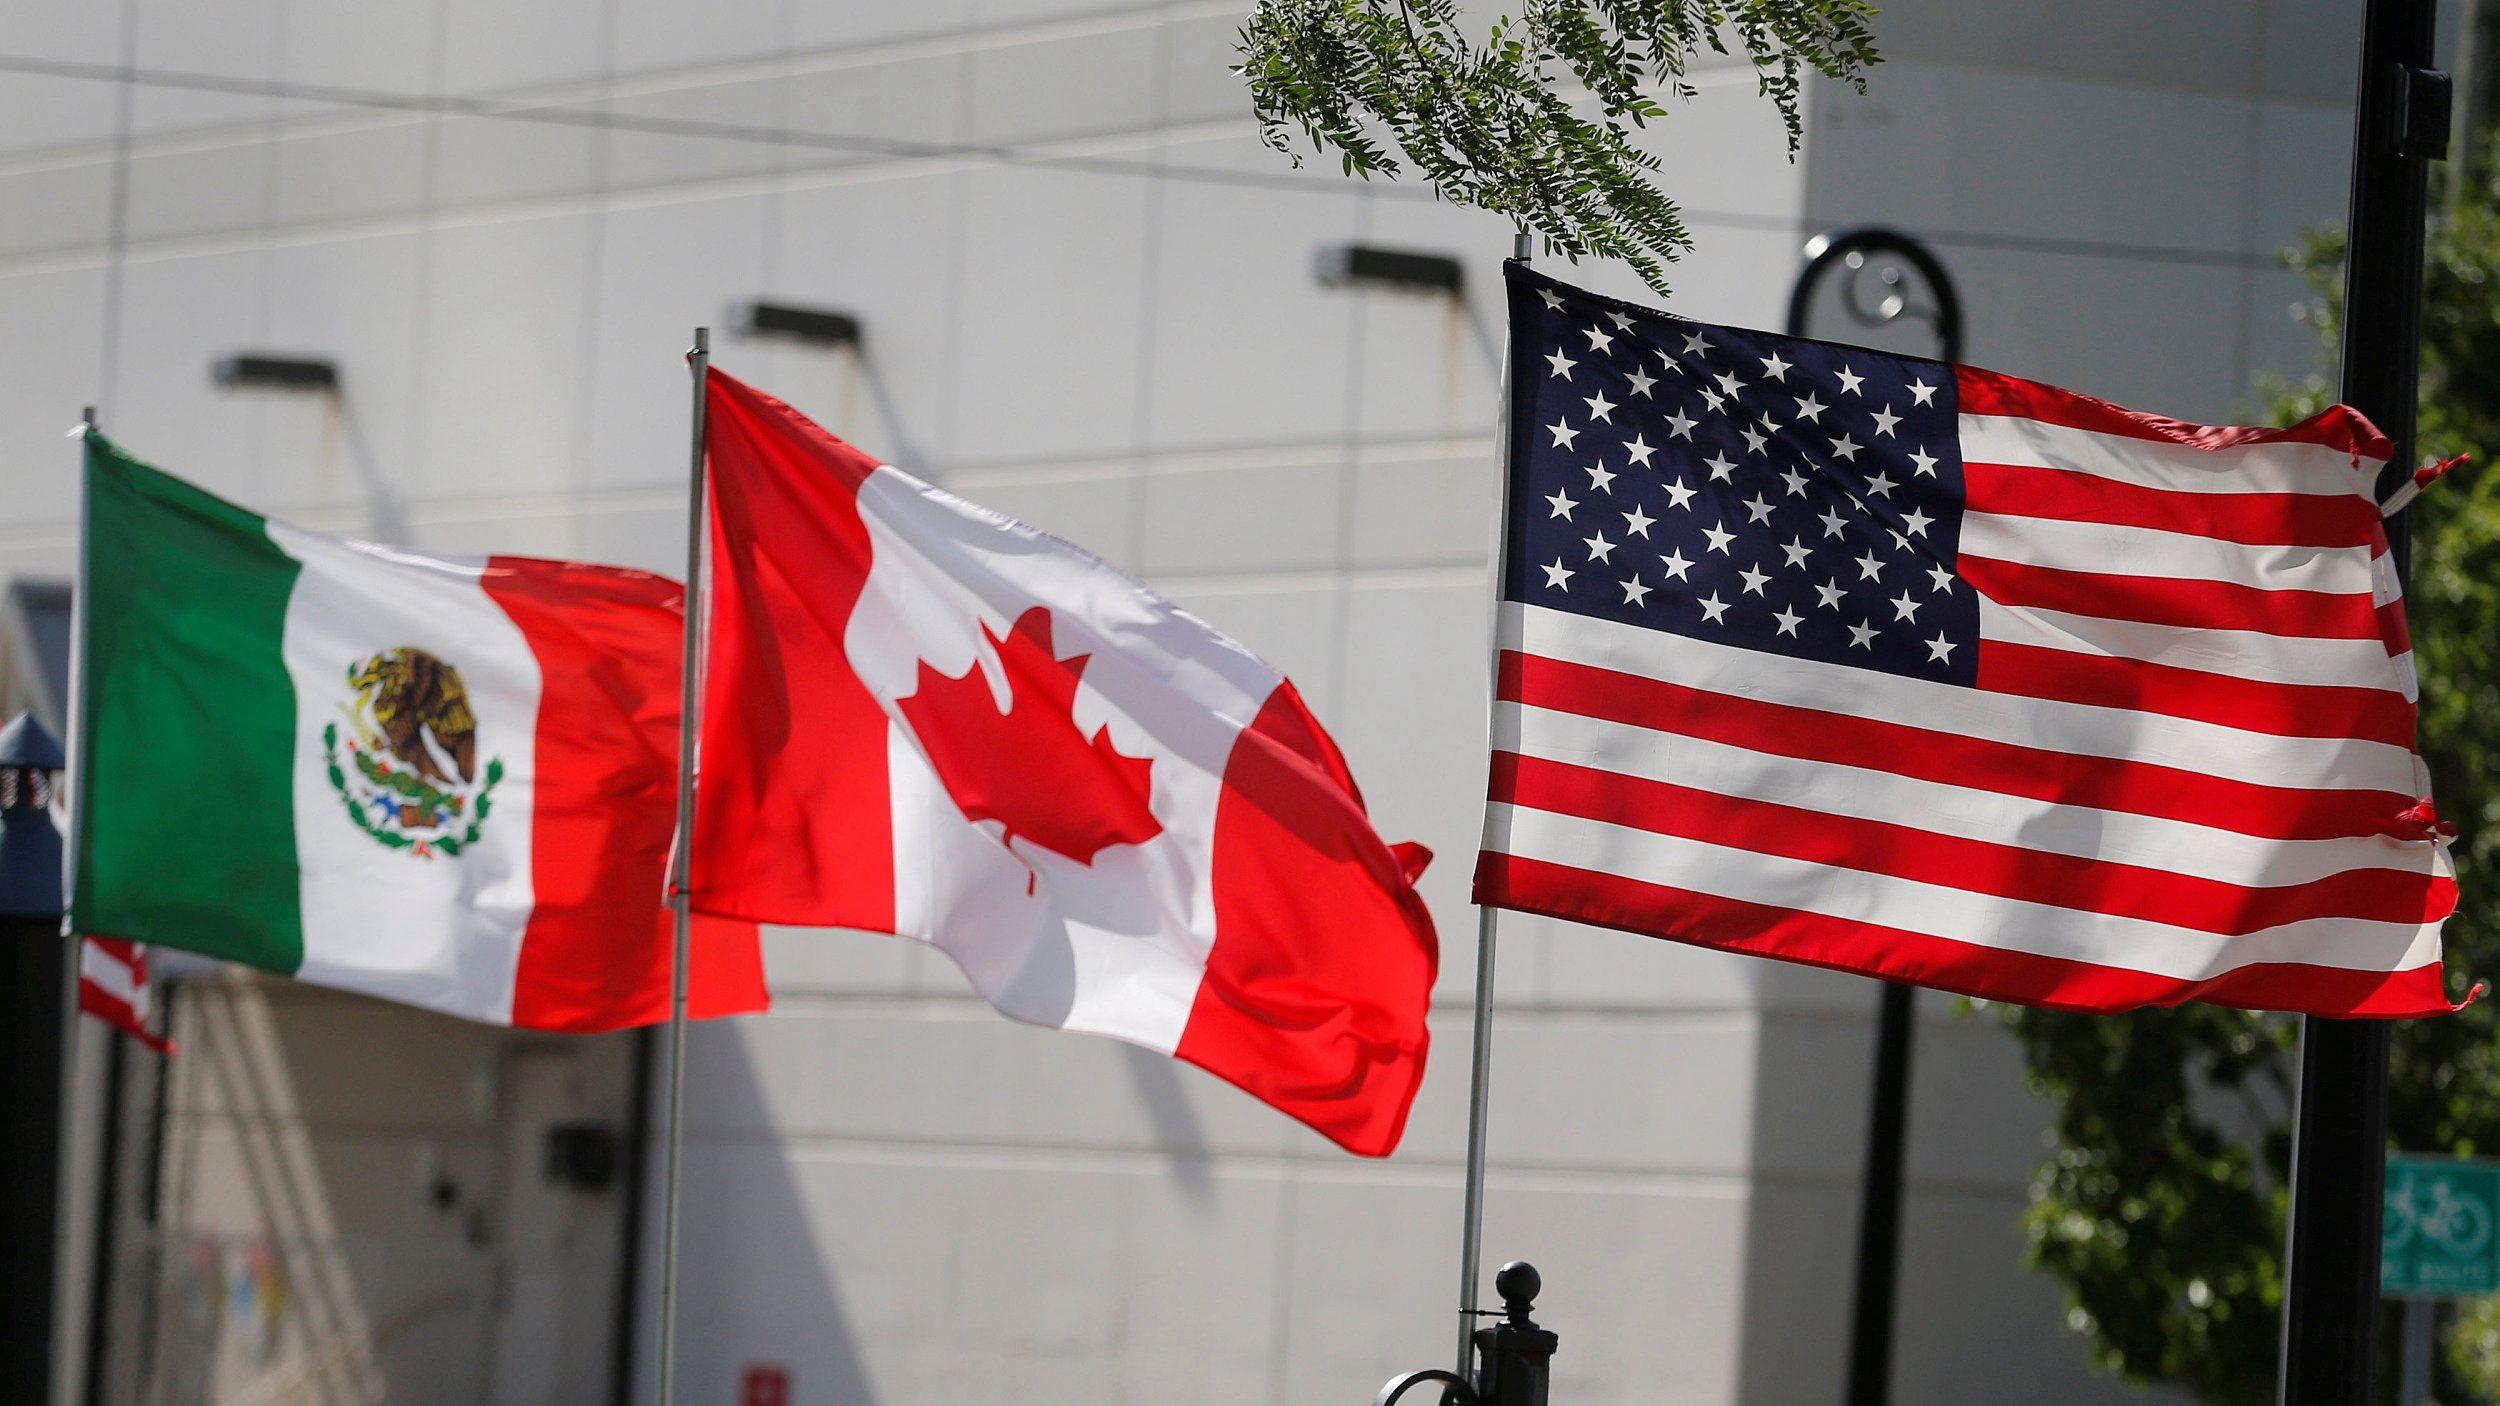 Mexico, Canada, US to meet Tuesday on trade deal: Mexico